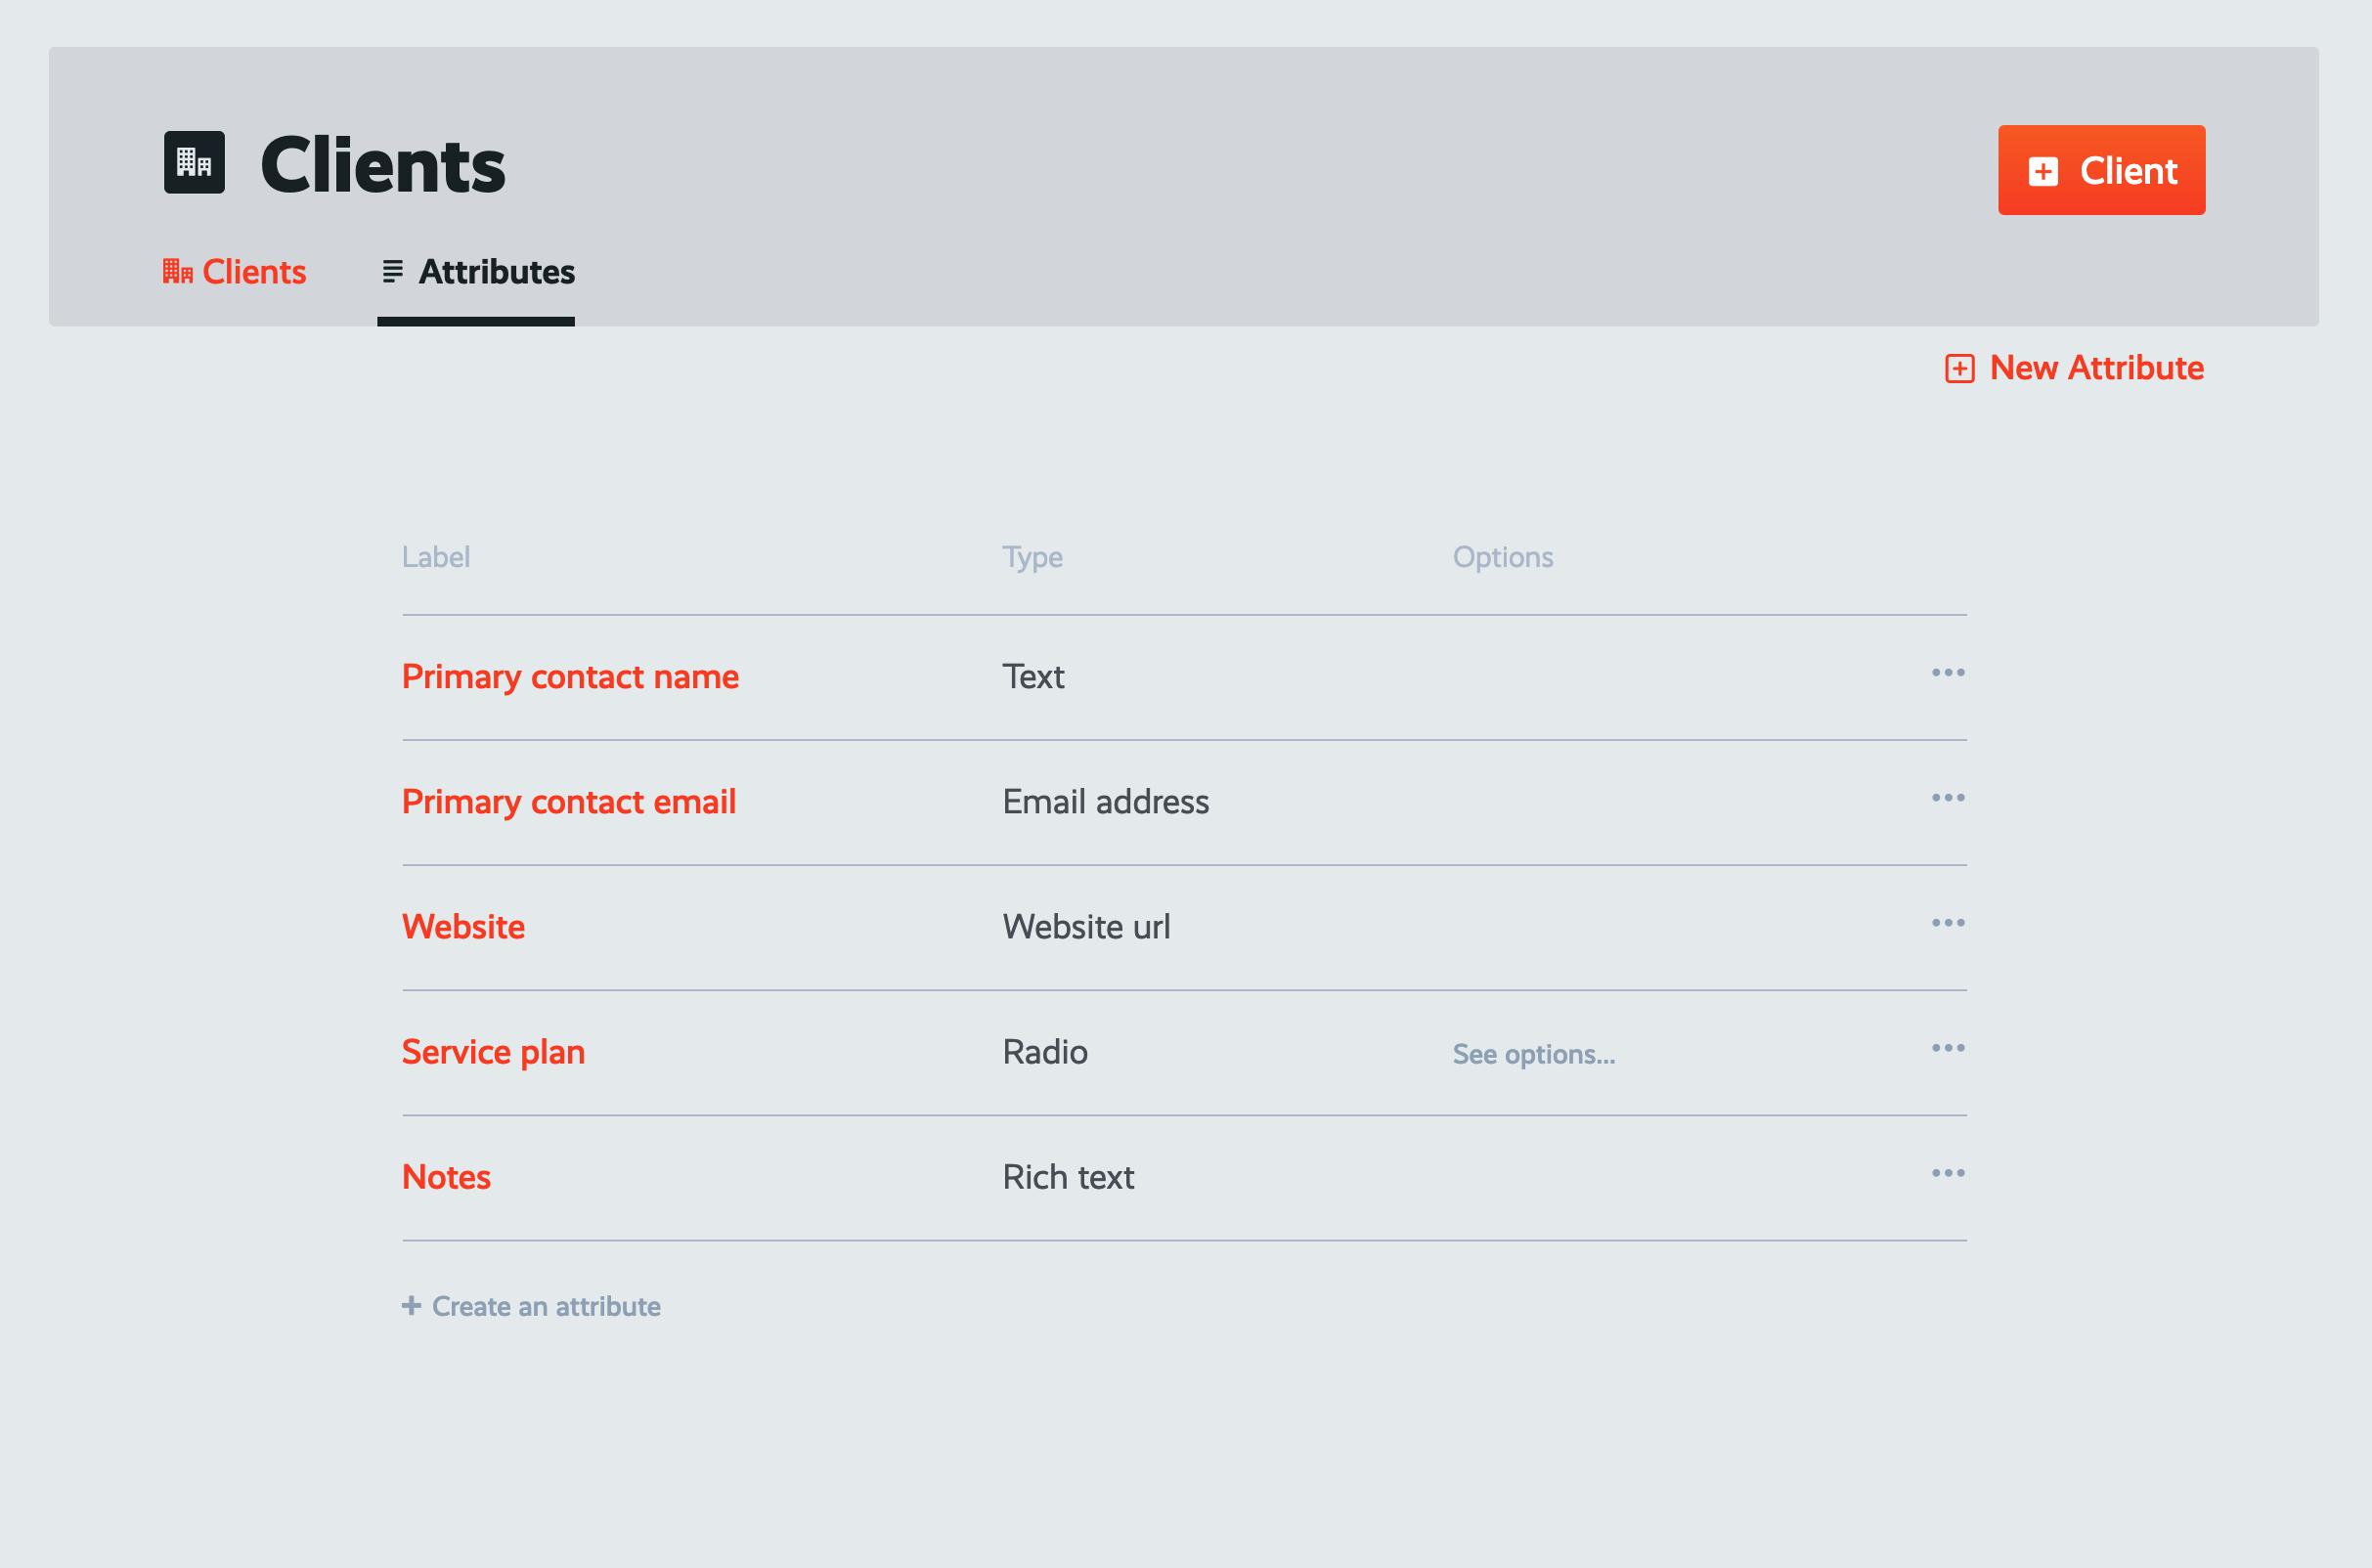 manage client attributes